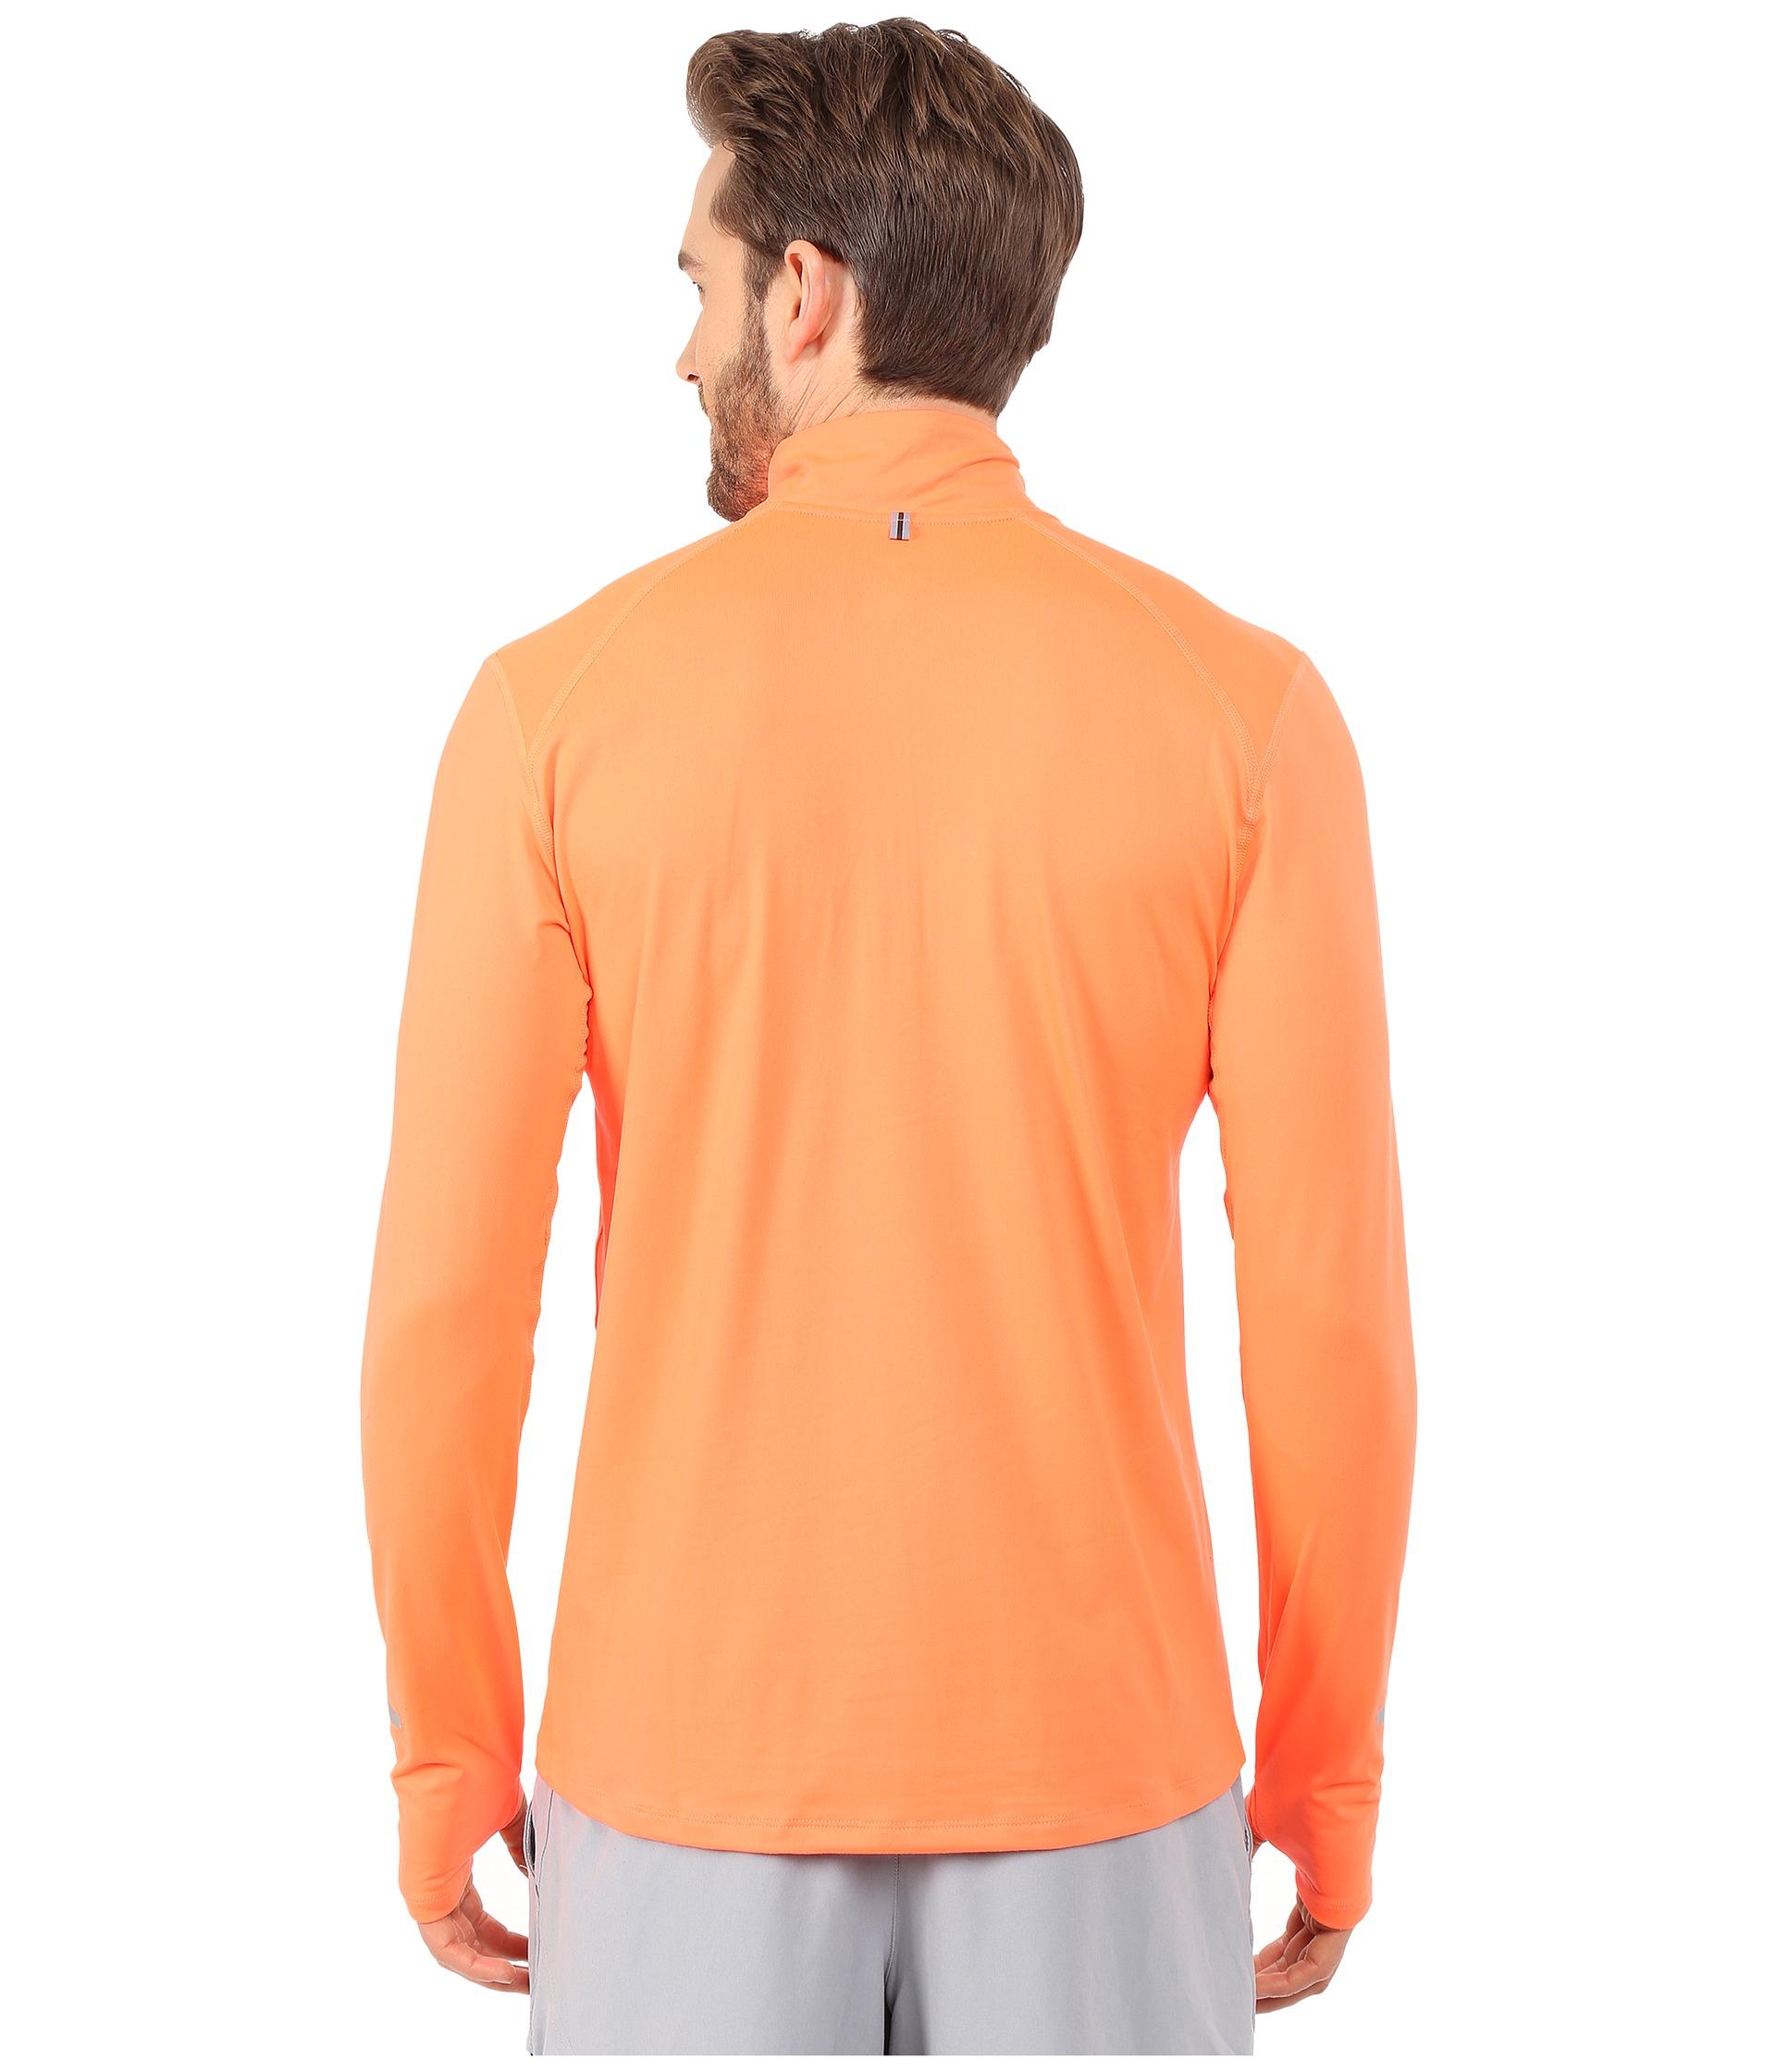 49055d696 Nike Dri-fit™ Element Half-zip Pullover in Orange for Men - Lyst